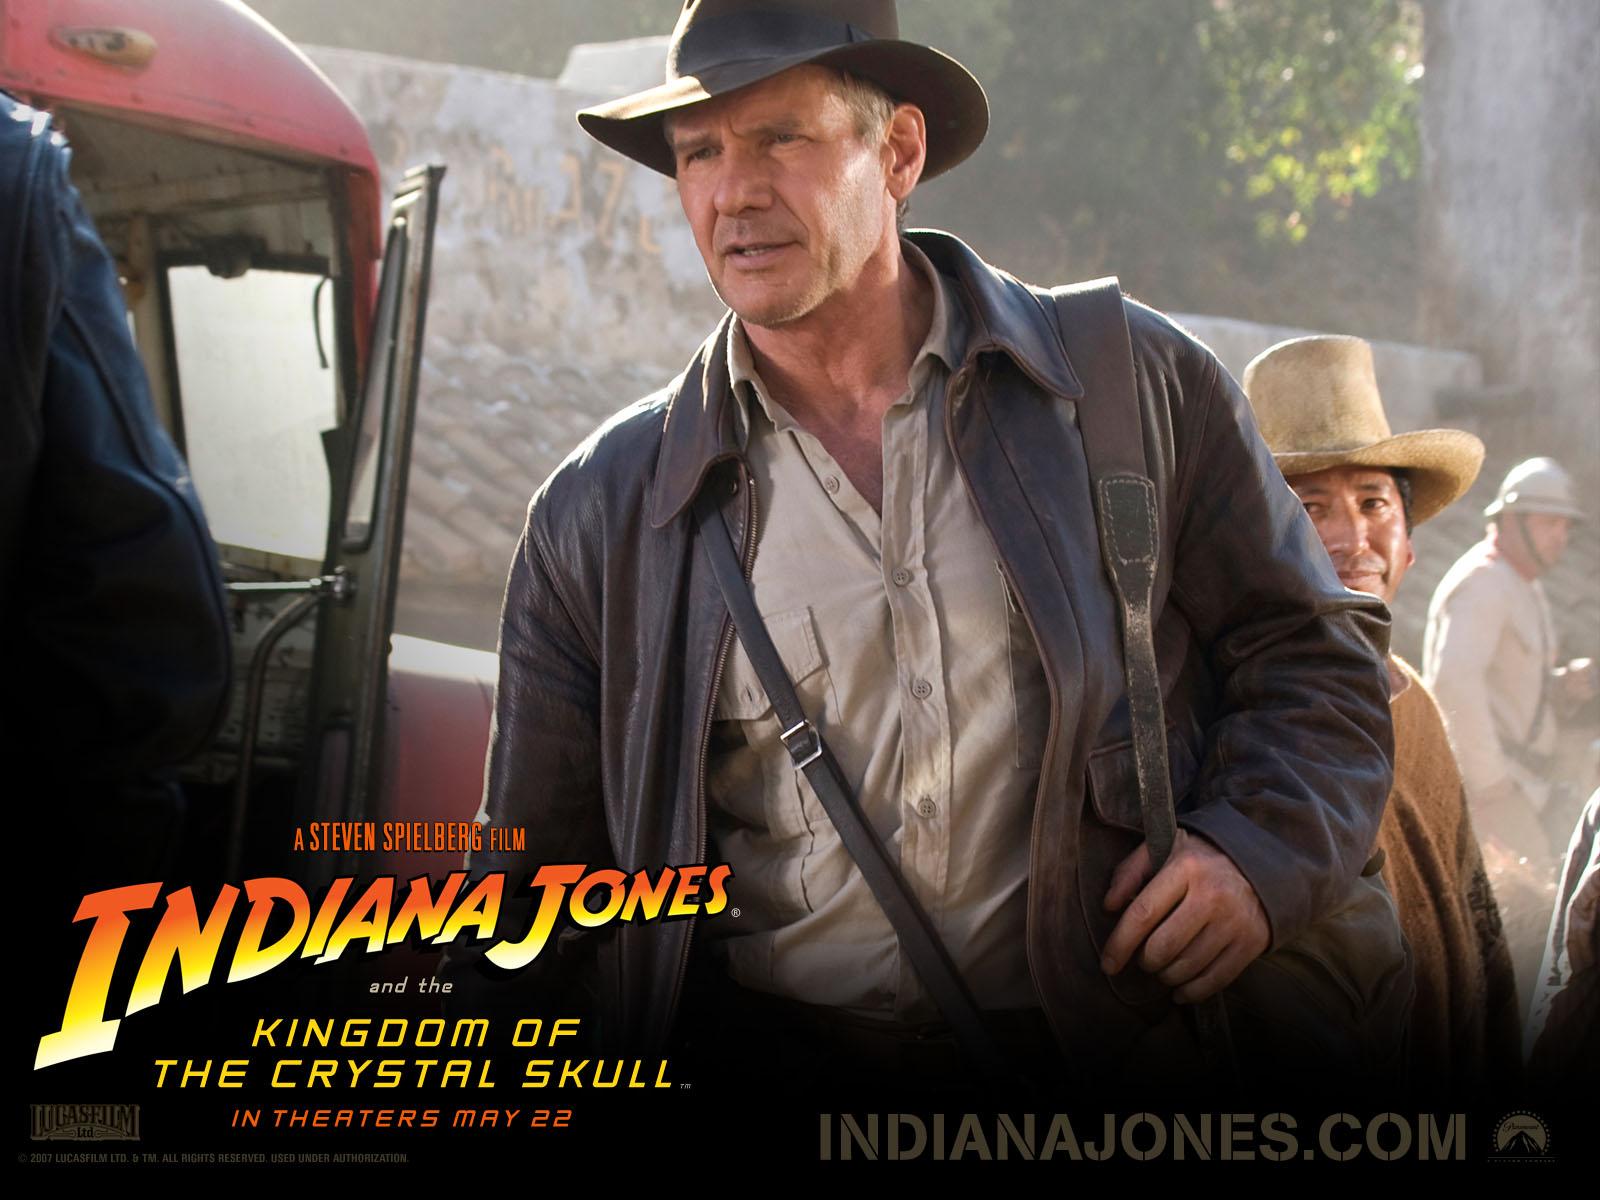 Photos Indiana Jones Indiana Jones and the Kingdom of the Crystal Skull film Movies